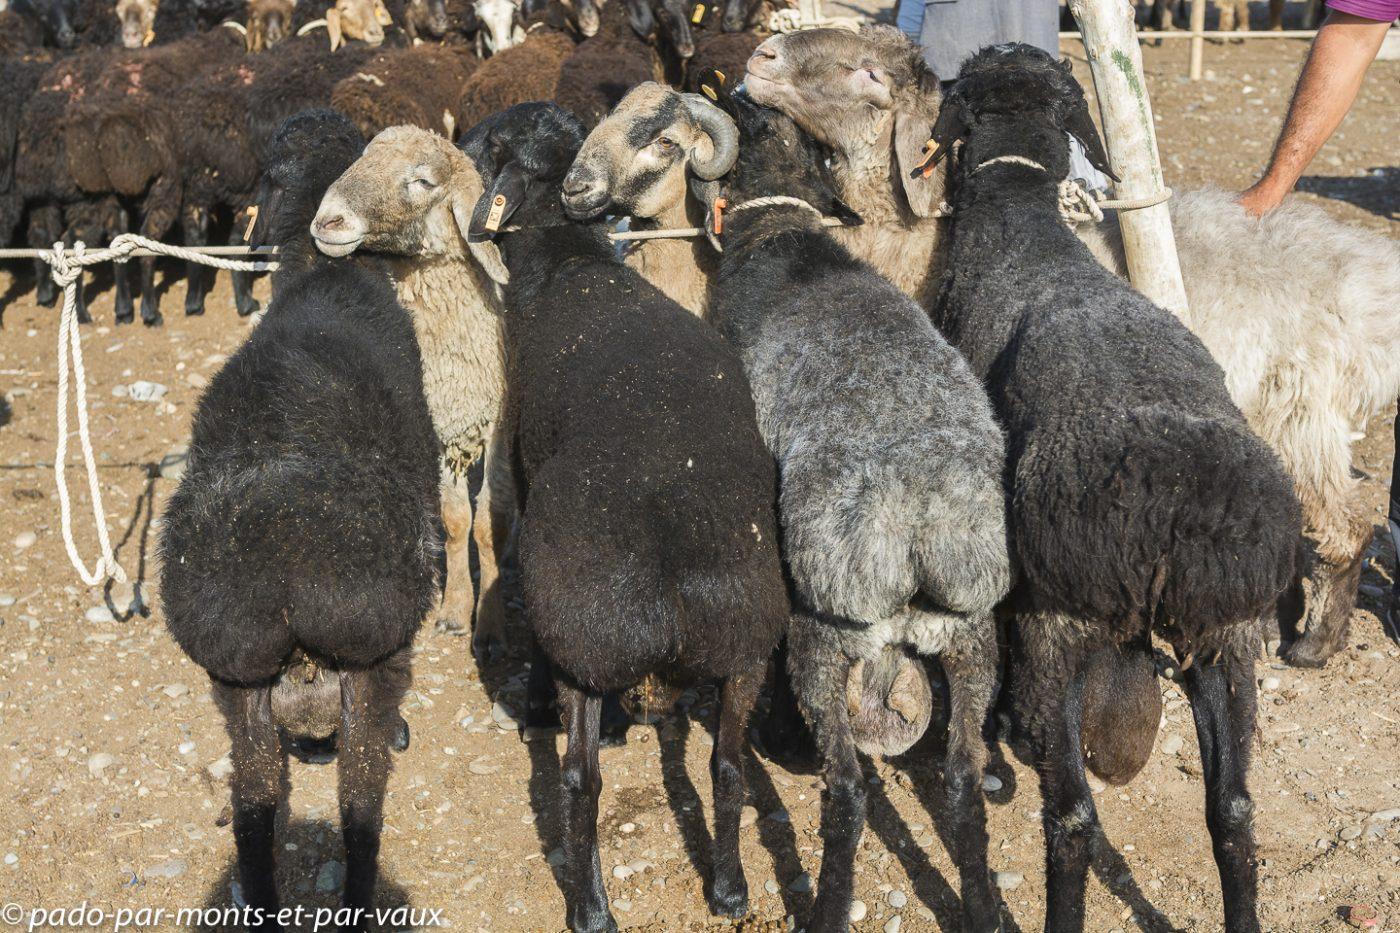 Kashgar - Marché aux bestiaux - Moutons karakul